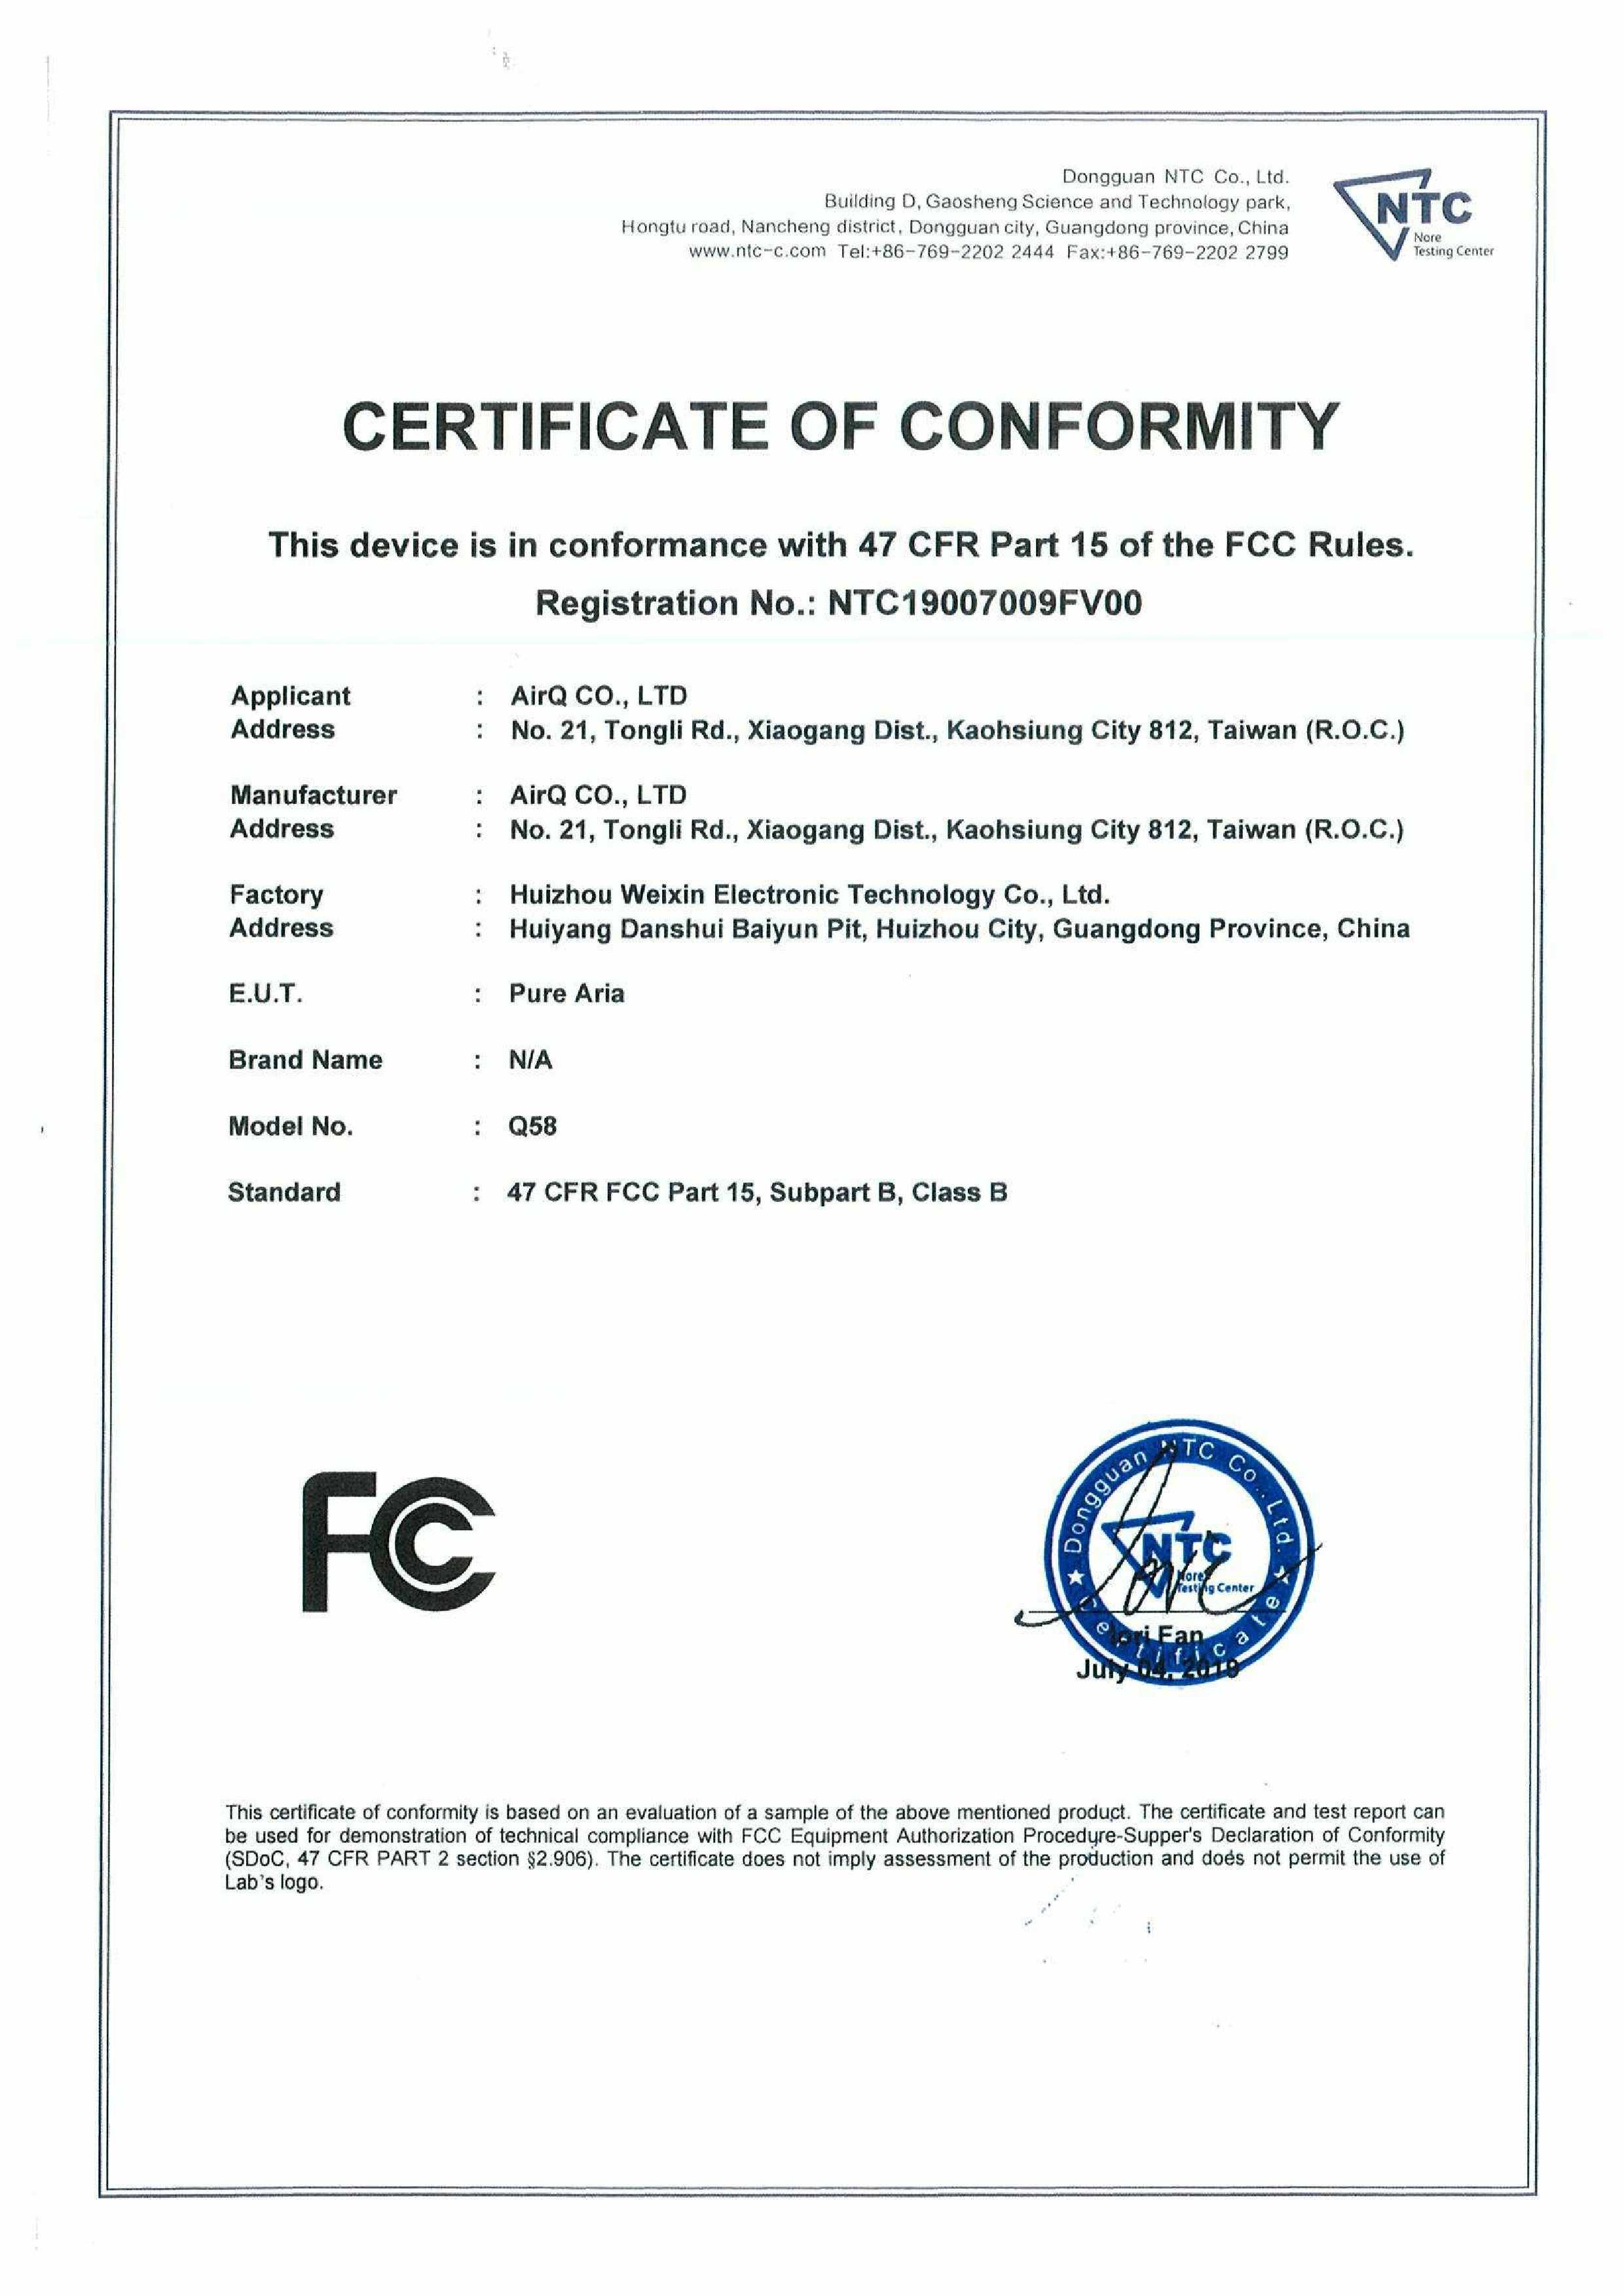 FCC-美國電子認證